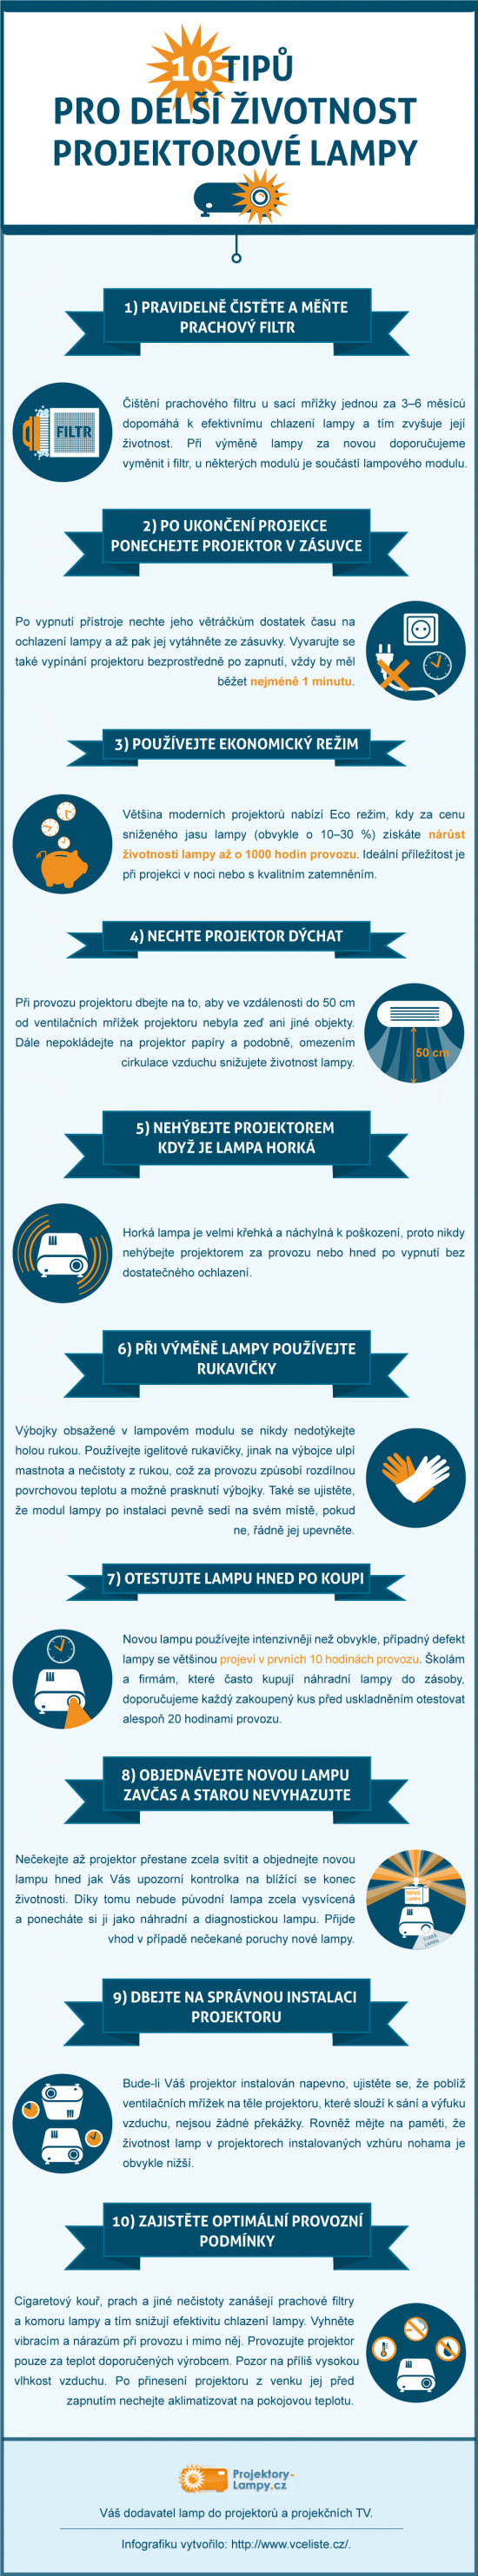 10 tipu pro vetsi zivotnost projektorove lampy - infografika